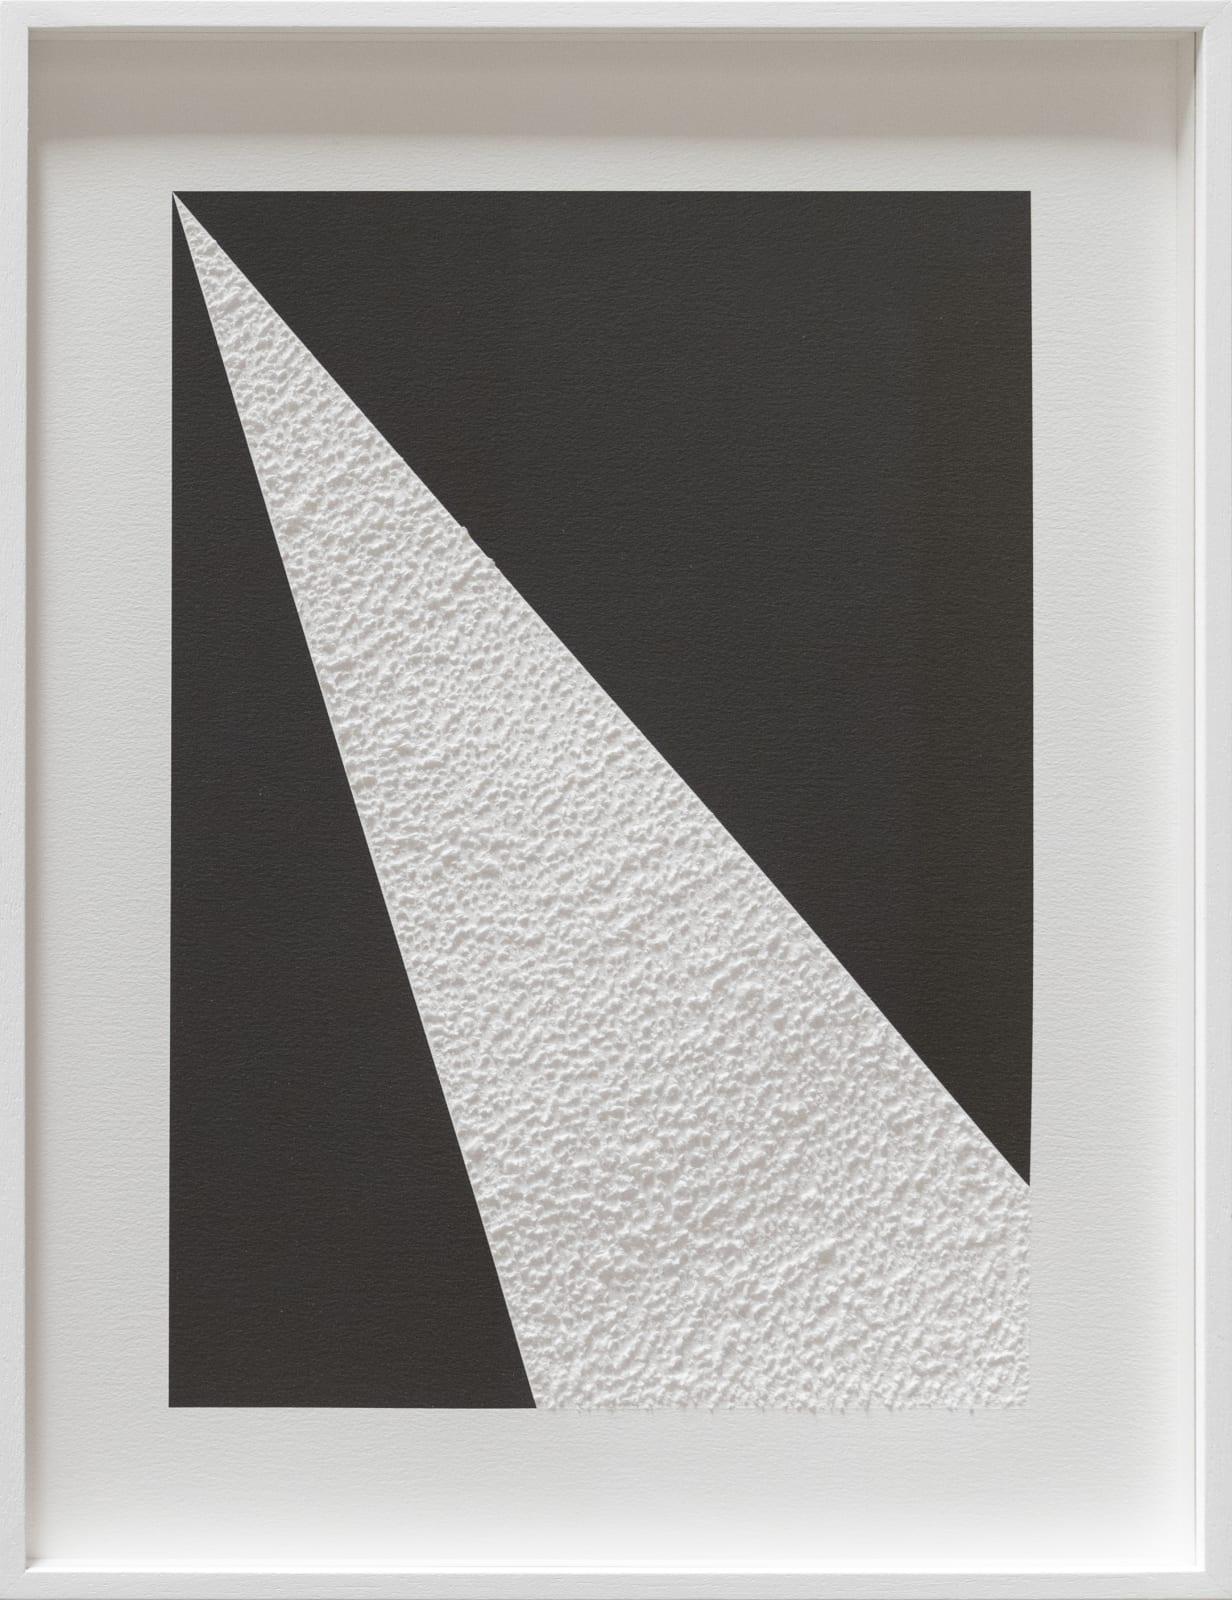 Mohammed Kazem, Sound of Angles No 12, 2020